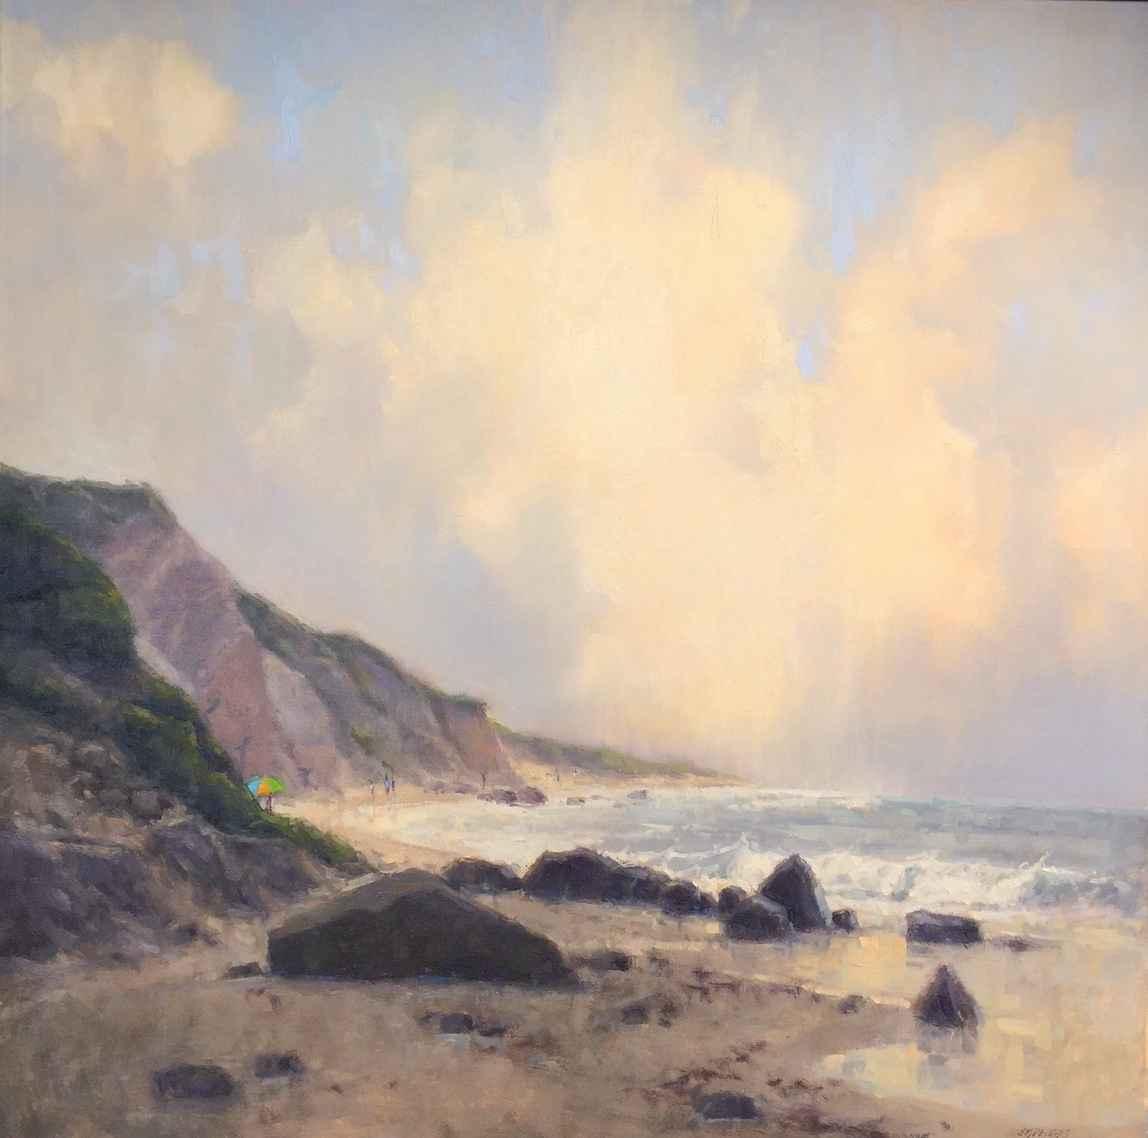 Aquinnah Cliffs by  Elise Phillips - Masterpiece Online